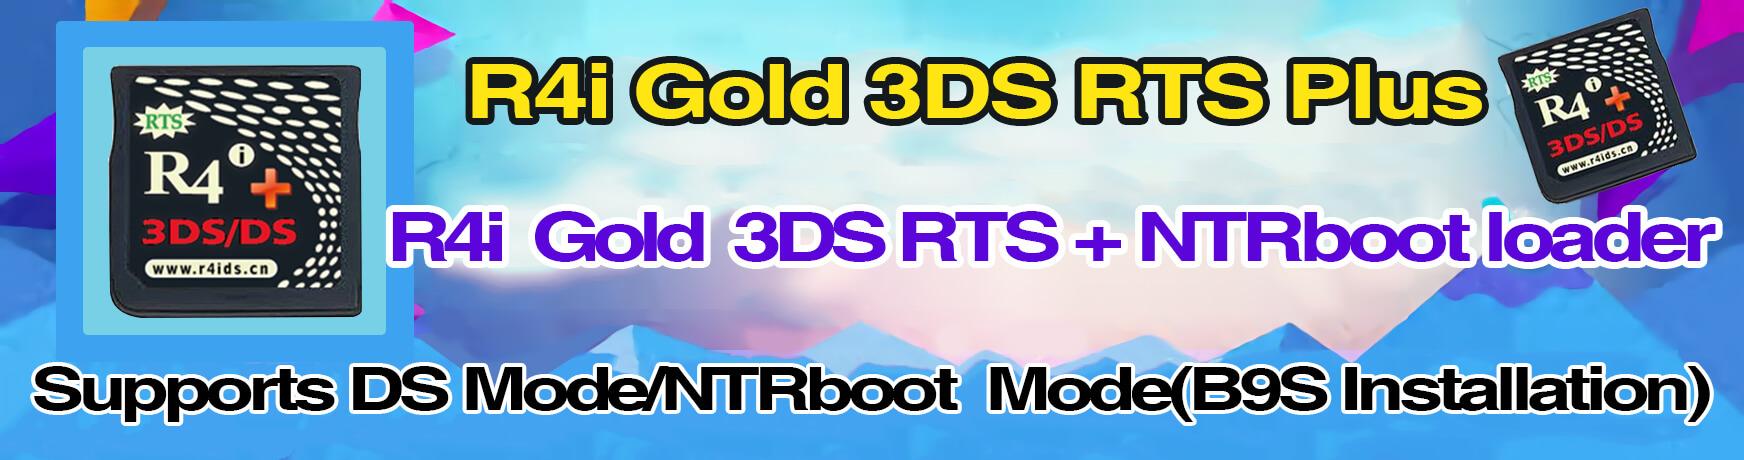 R4i gold 3ds plus